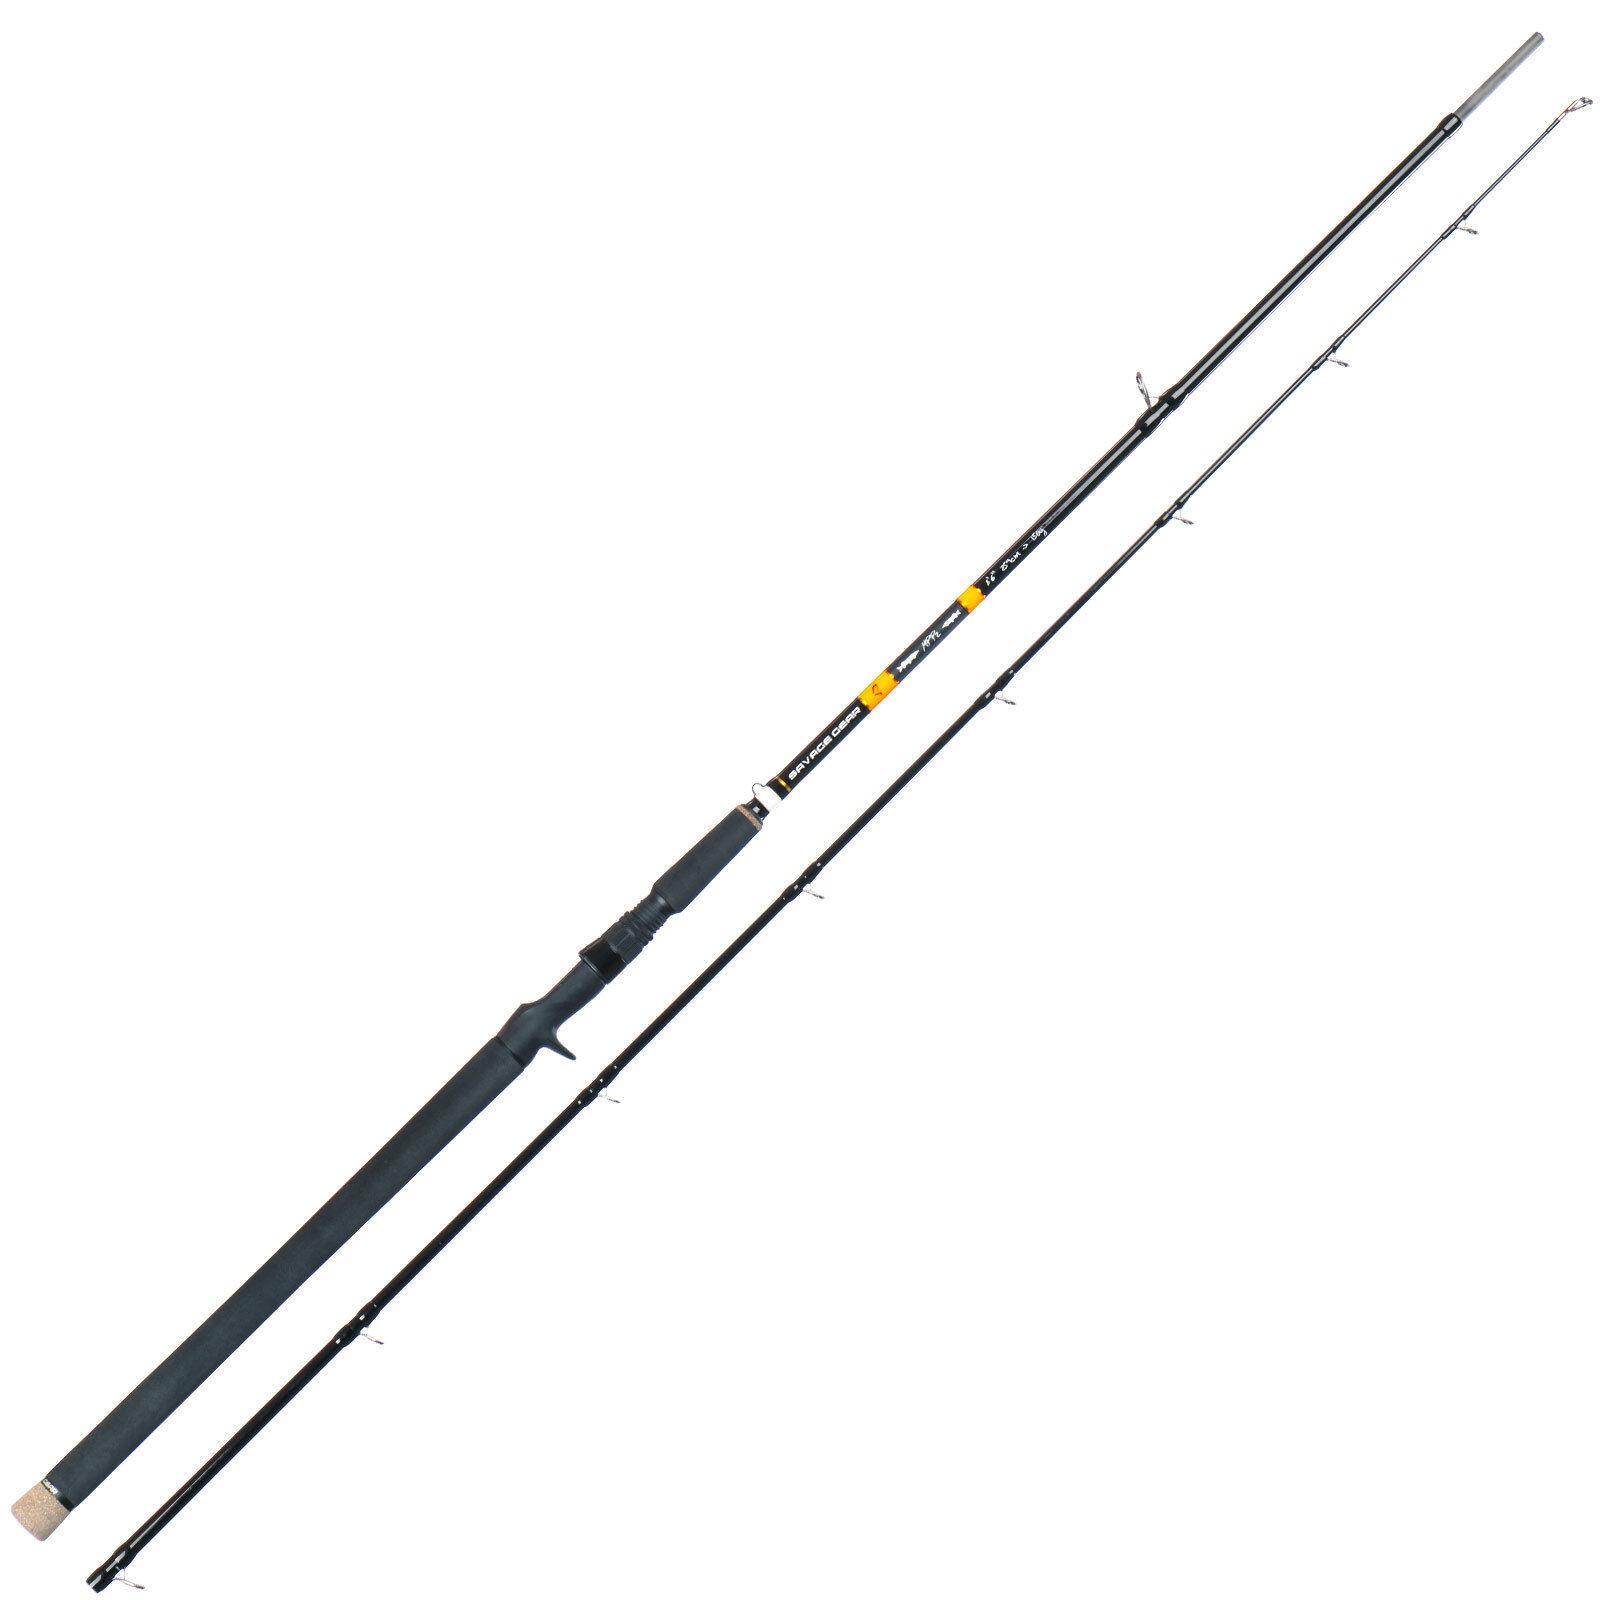 Savage Gear Baitcaster stadia triggerrutetrigger mpp2 8ft6in 2,59m a 150g